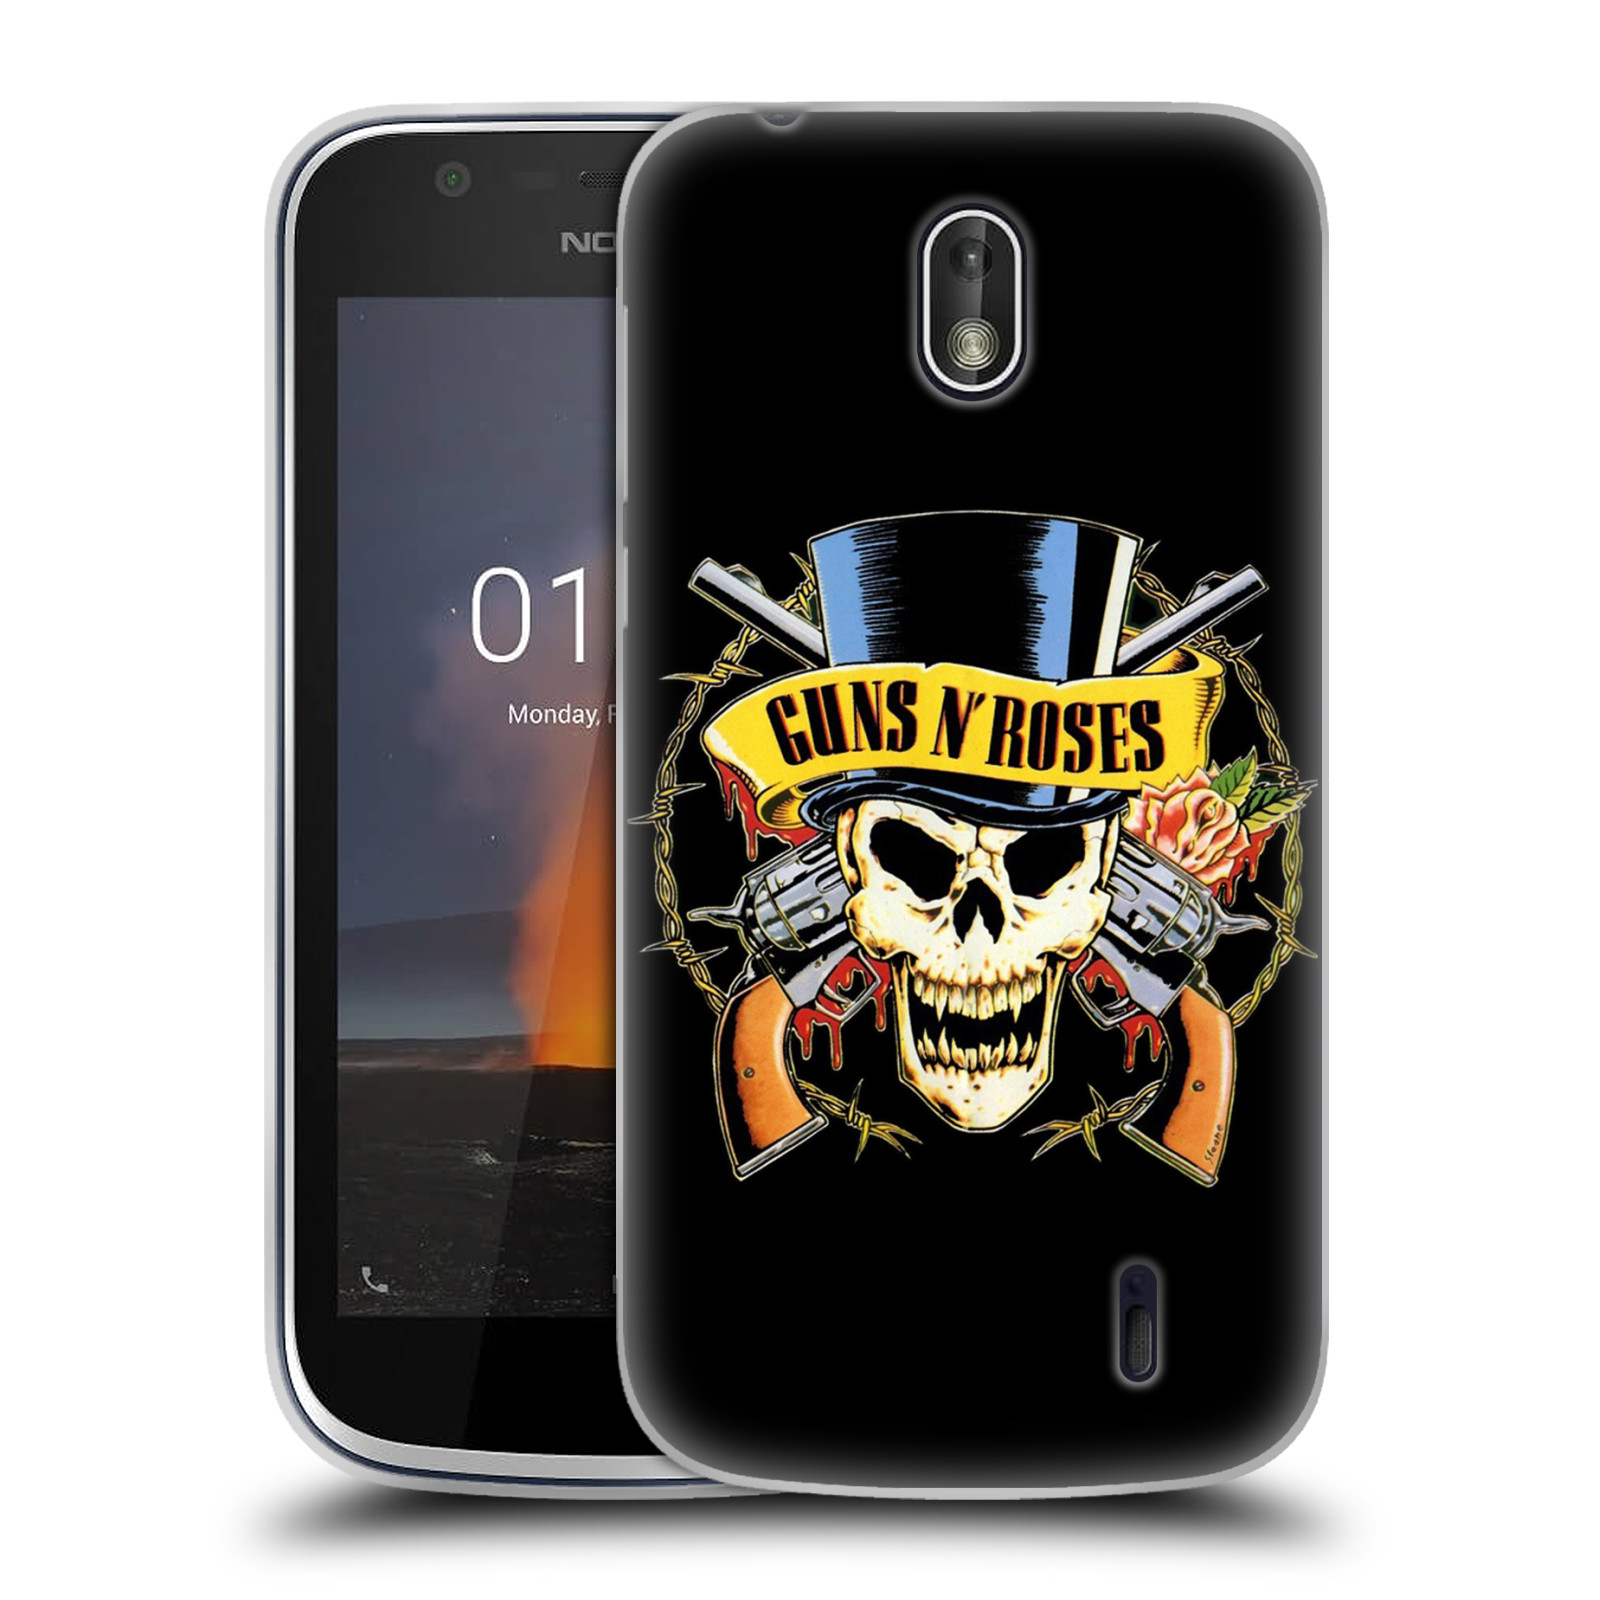 Silikonové pouzdro na mobil Nokia 1 - Head Case - Guns N' Roses - Lebka